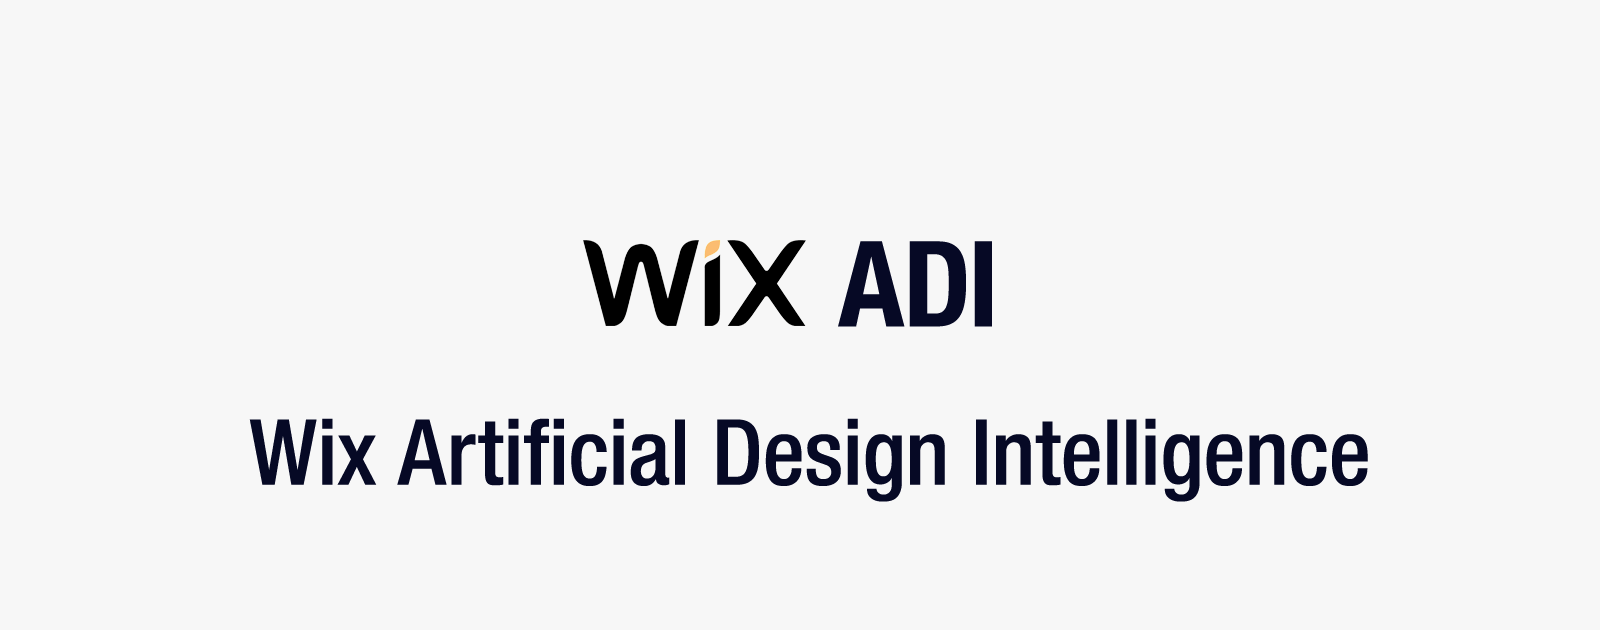 Web制作の自由度をフレームワークレベルまで高めたCorvid by Wix